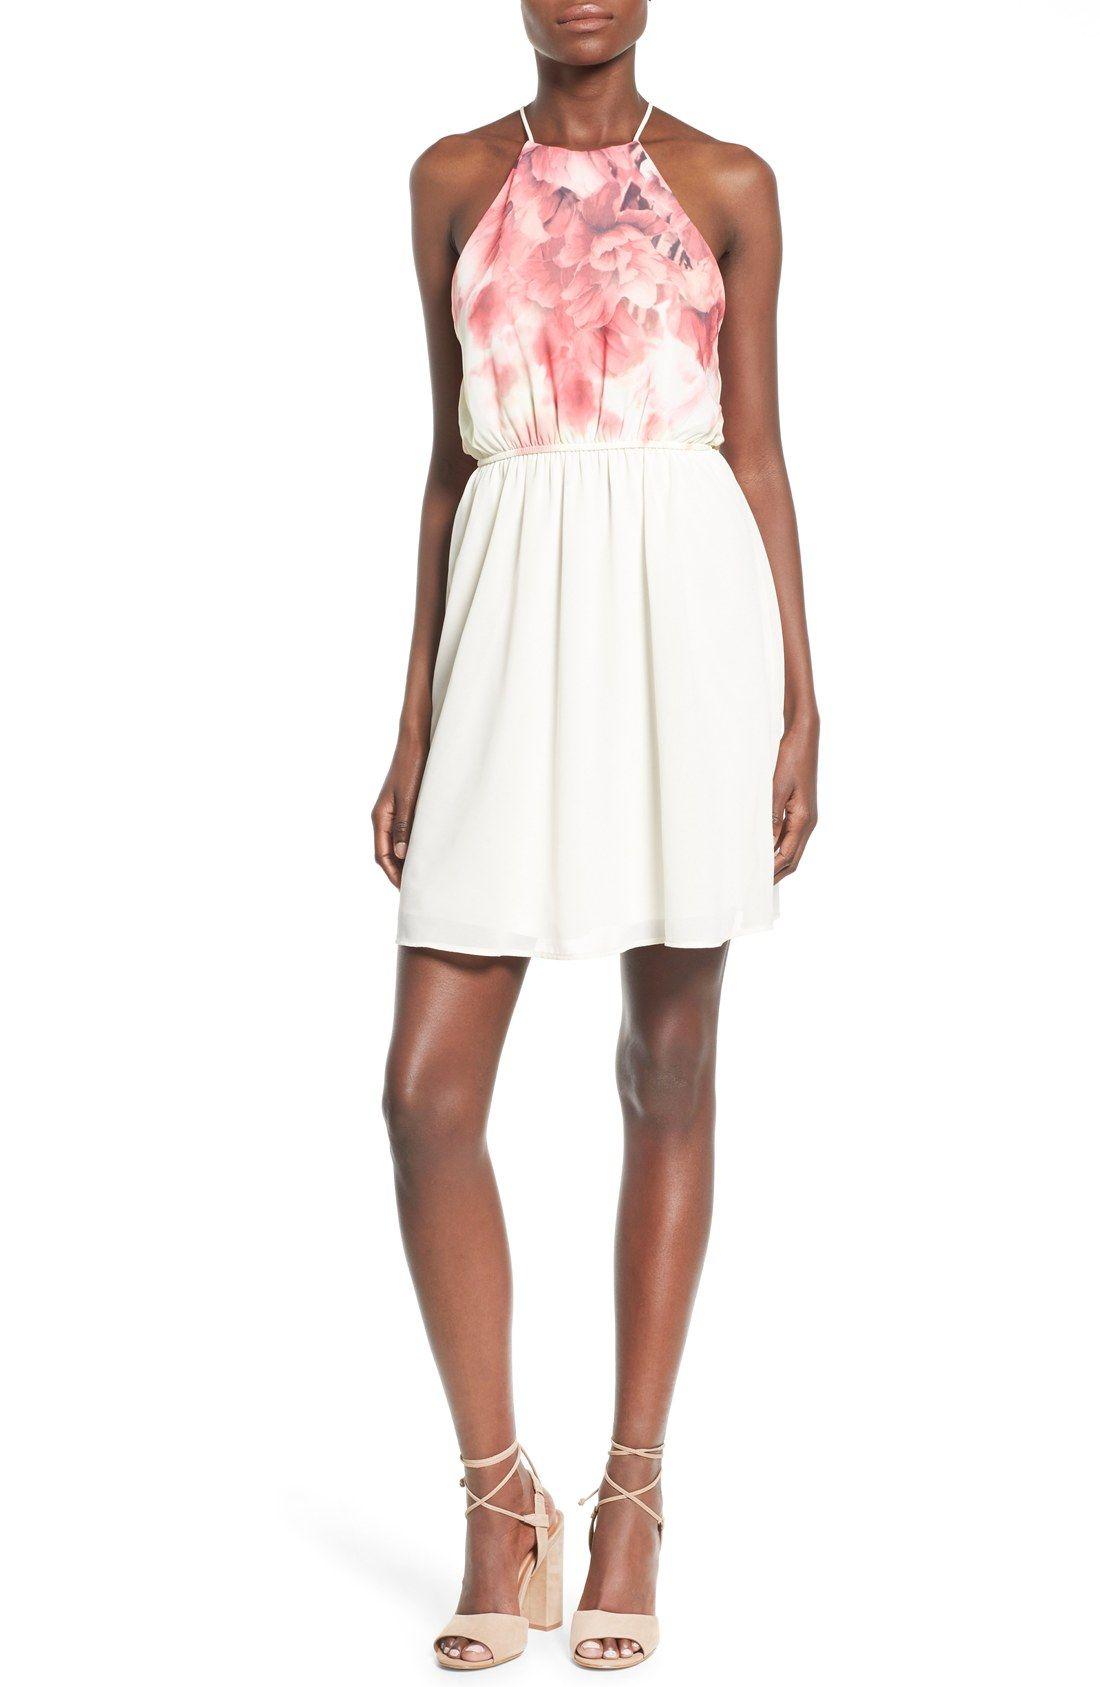 00d2cbee4814 jella c. Floral Print Halter Skater Dress | my style | Dresses ...